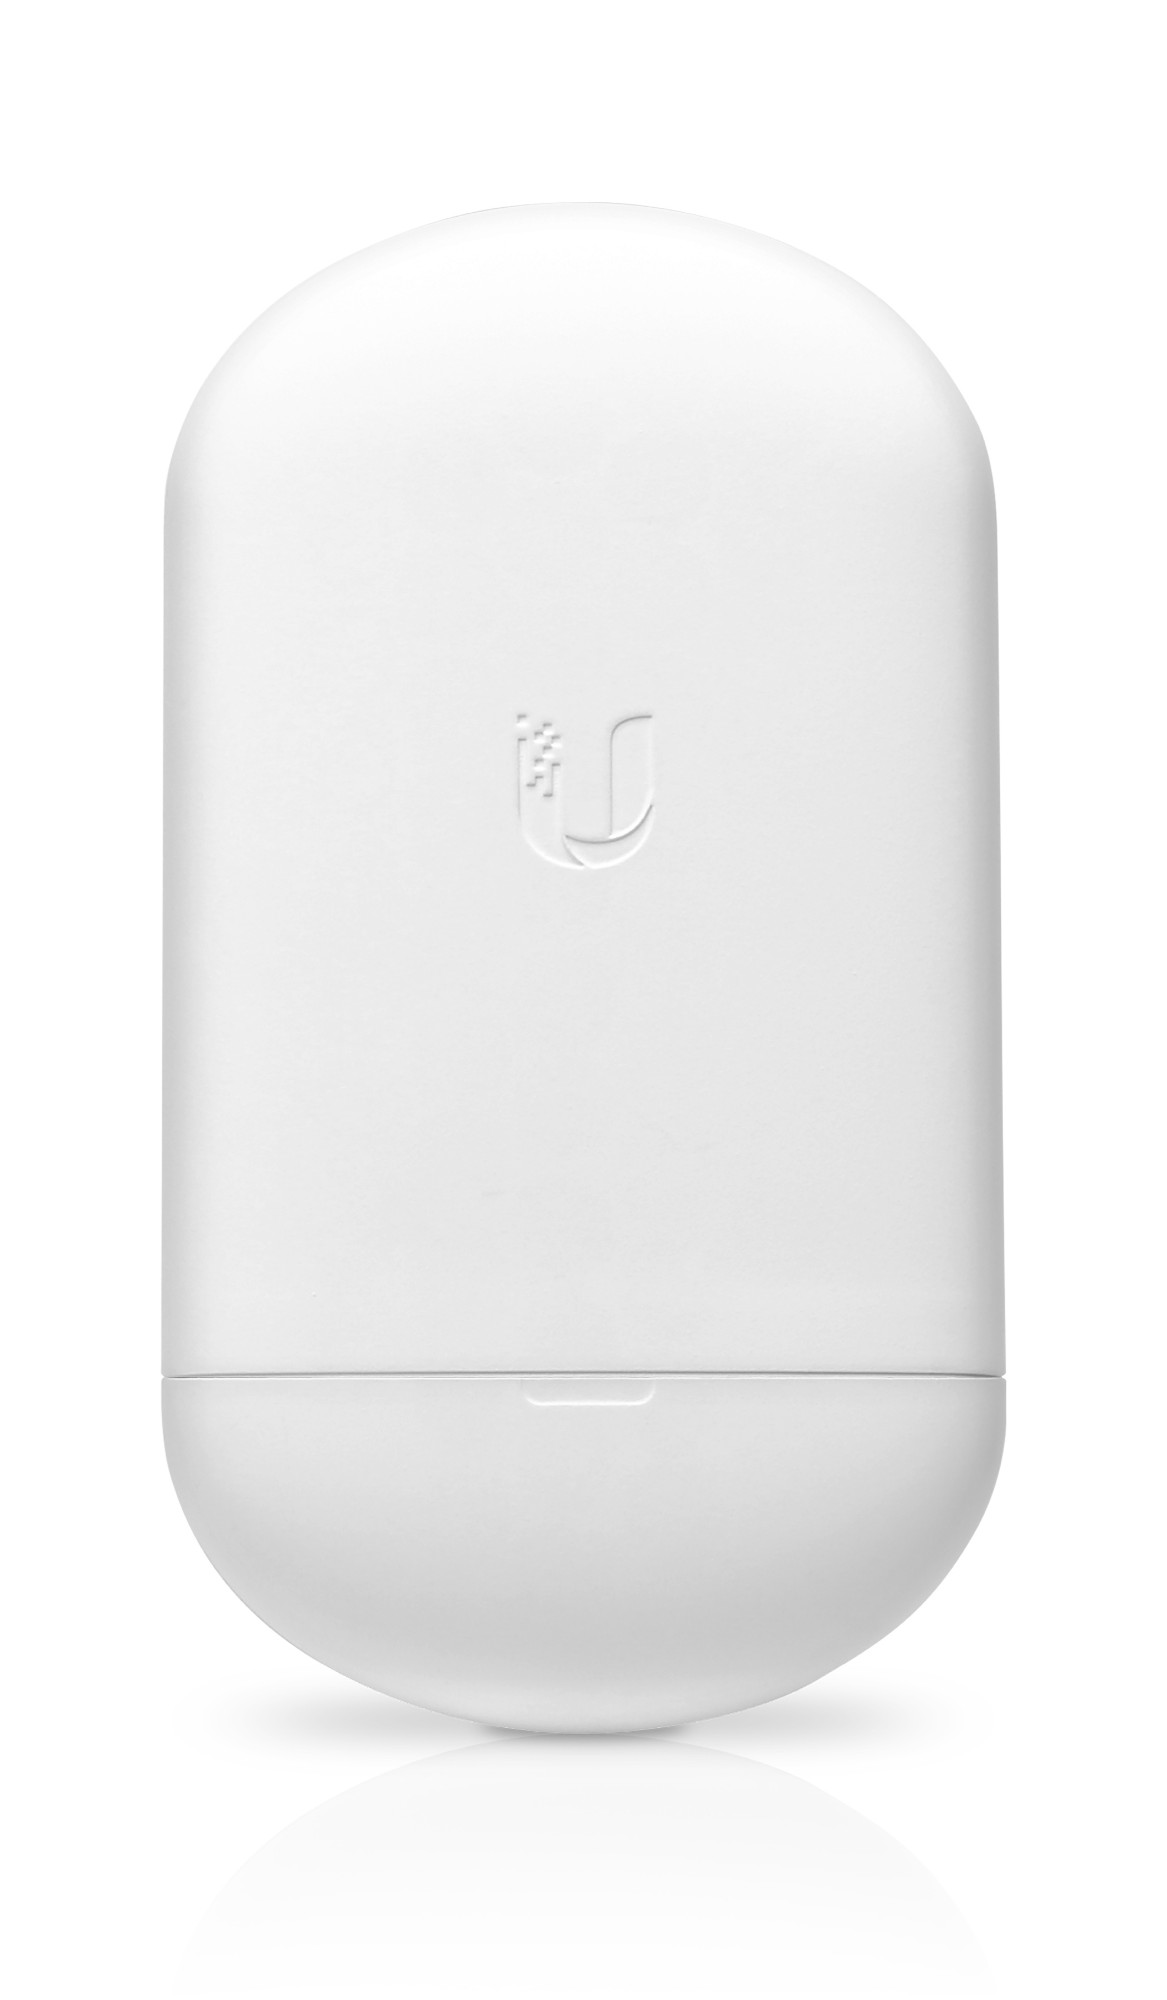 Ubiquiti Networks NanoStation 5AC Loco 1000 Mbit/s Power over Ethernet (PoE) White